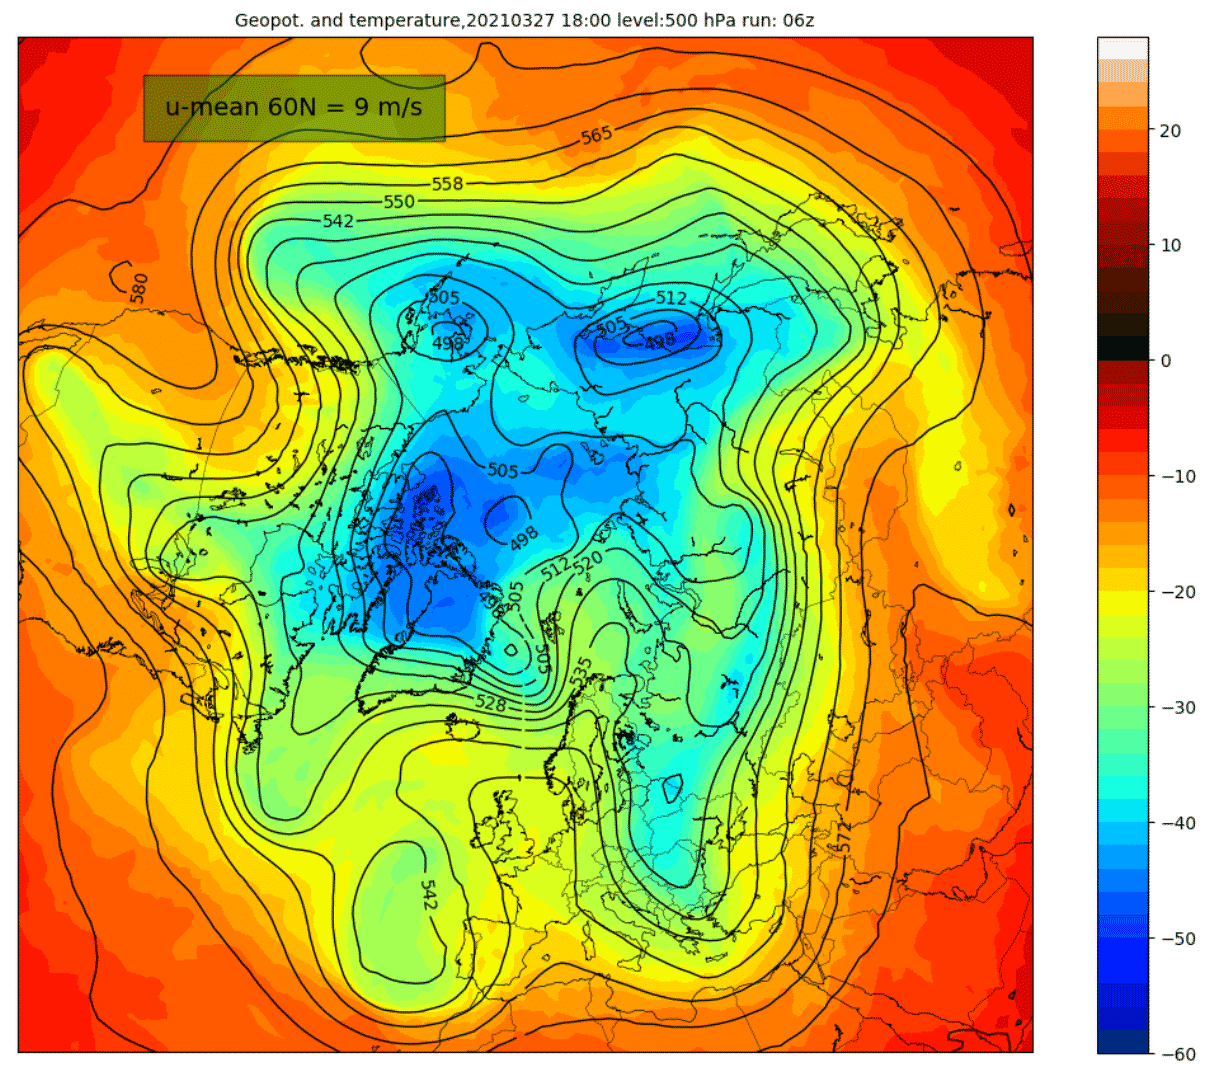 weather-forecast-march-april-2021-united-states-europe-polar-vortex-troposphere